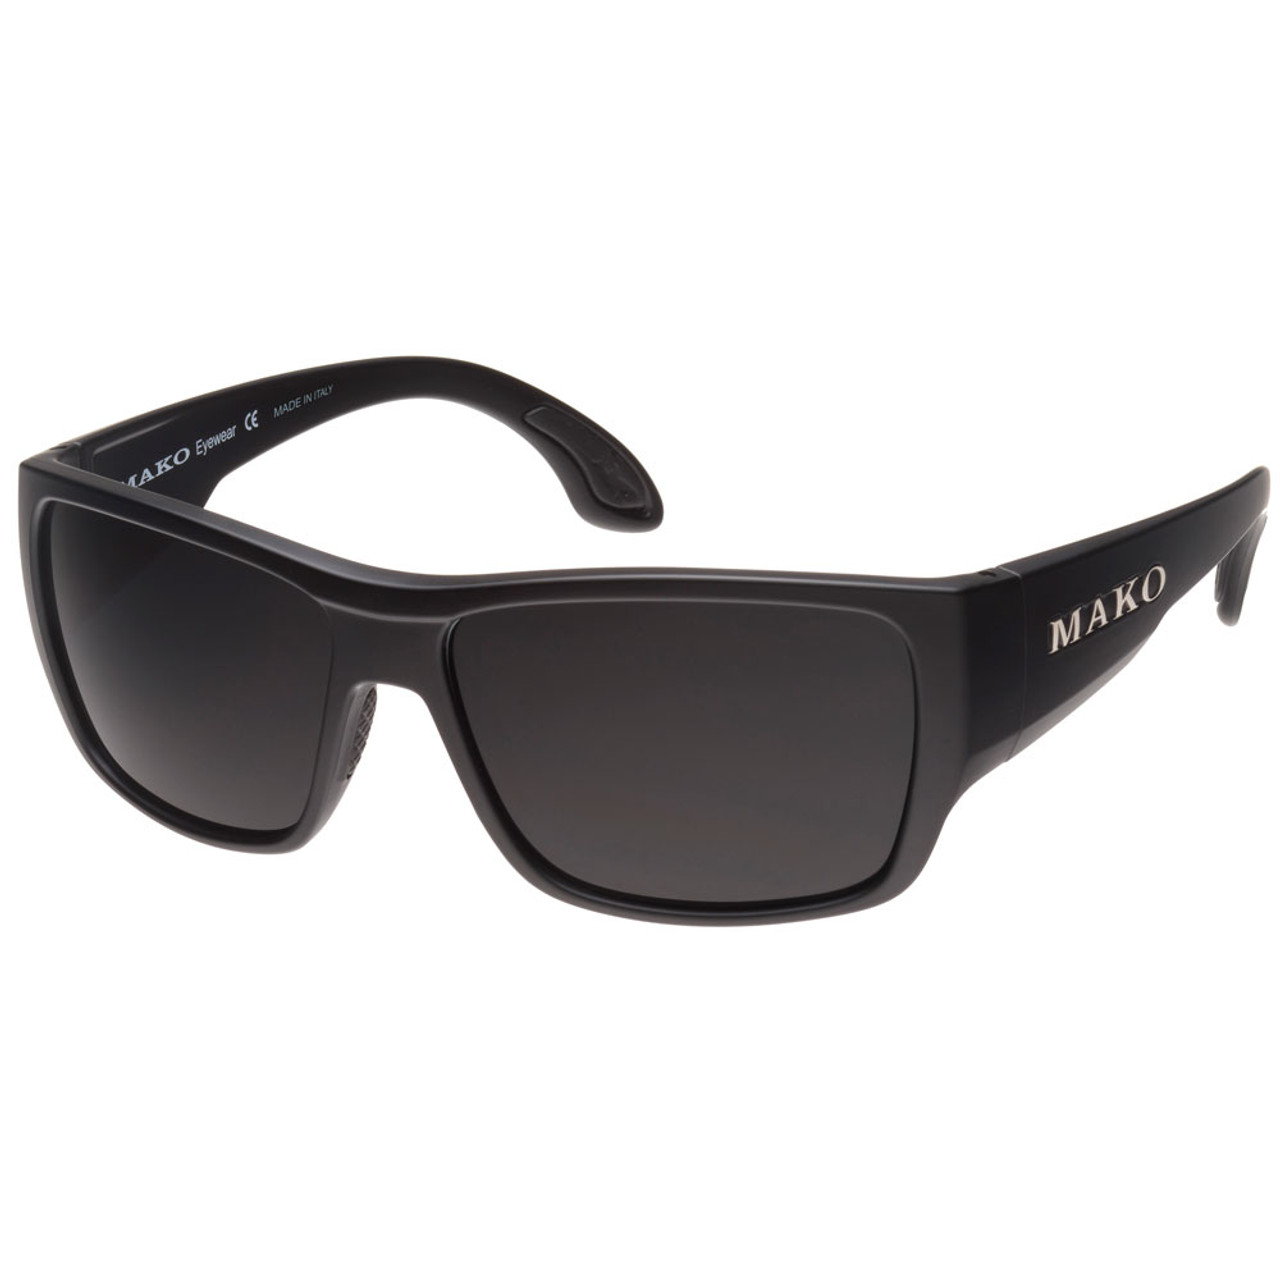 87b621bc7d Mako Covert Sunglasses Polarised Popular Model